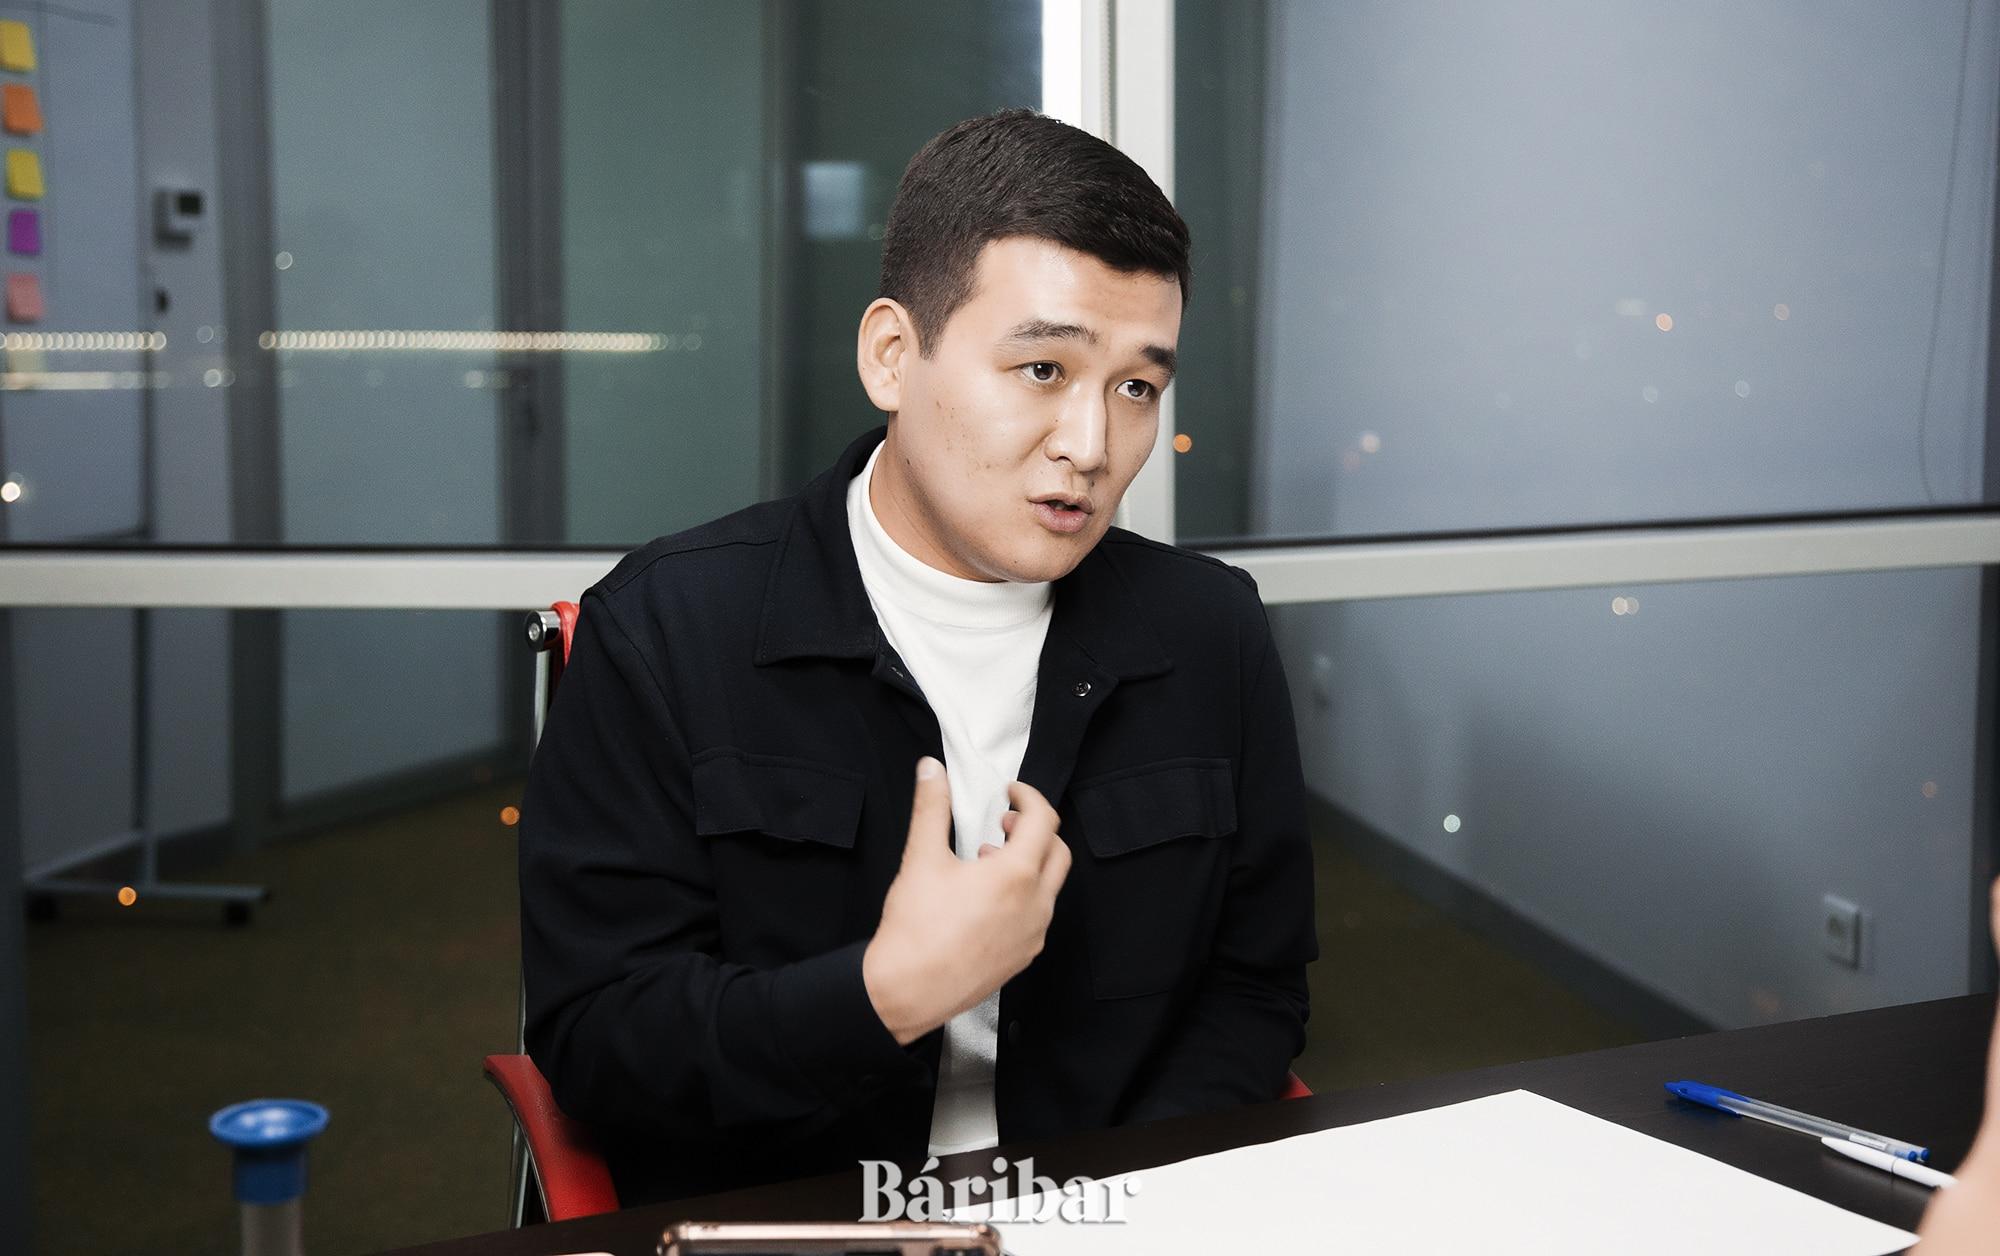 Ескендір Бестай, педагог. Фото: Айгүл Хожантаева